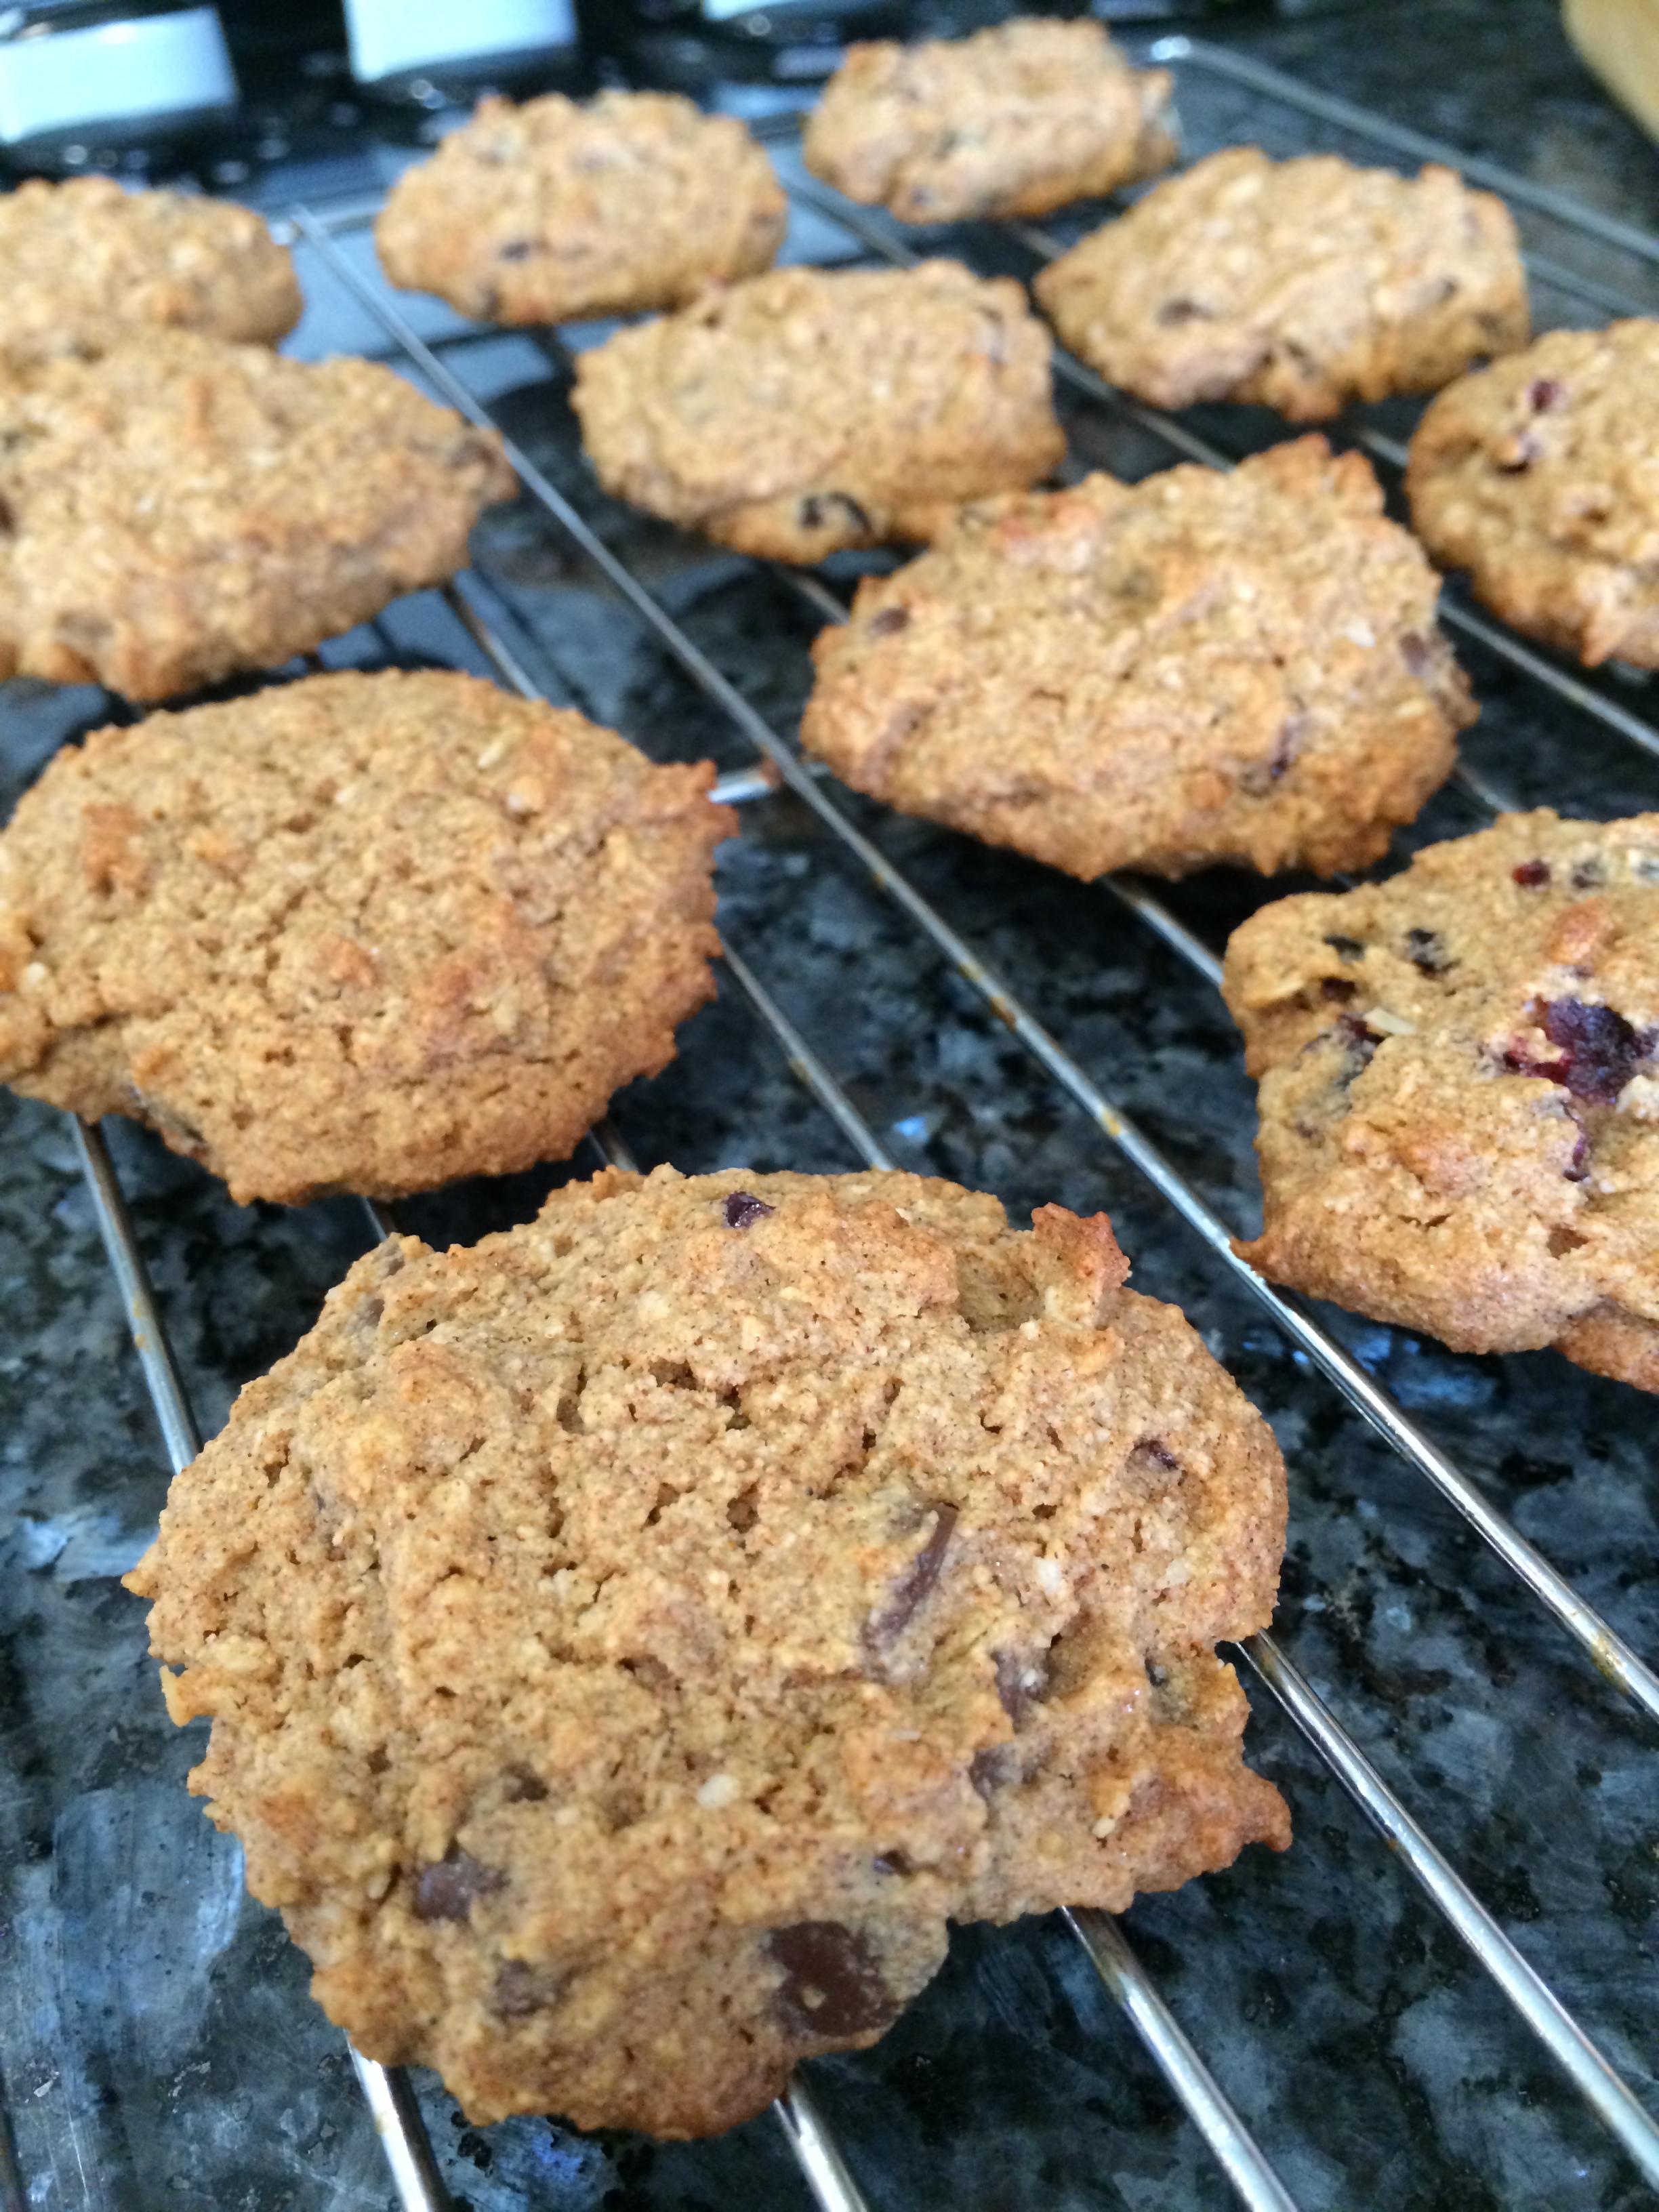 Noatmeal cookies